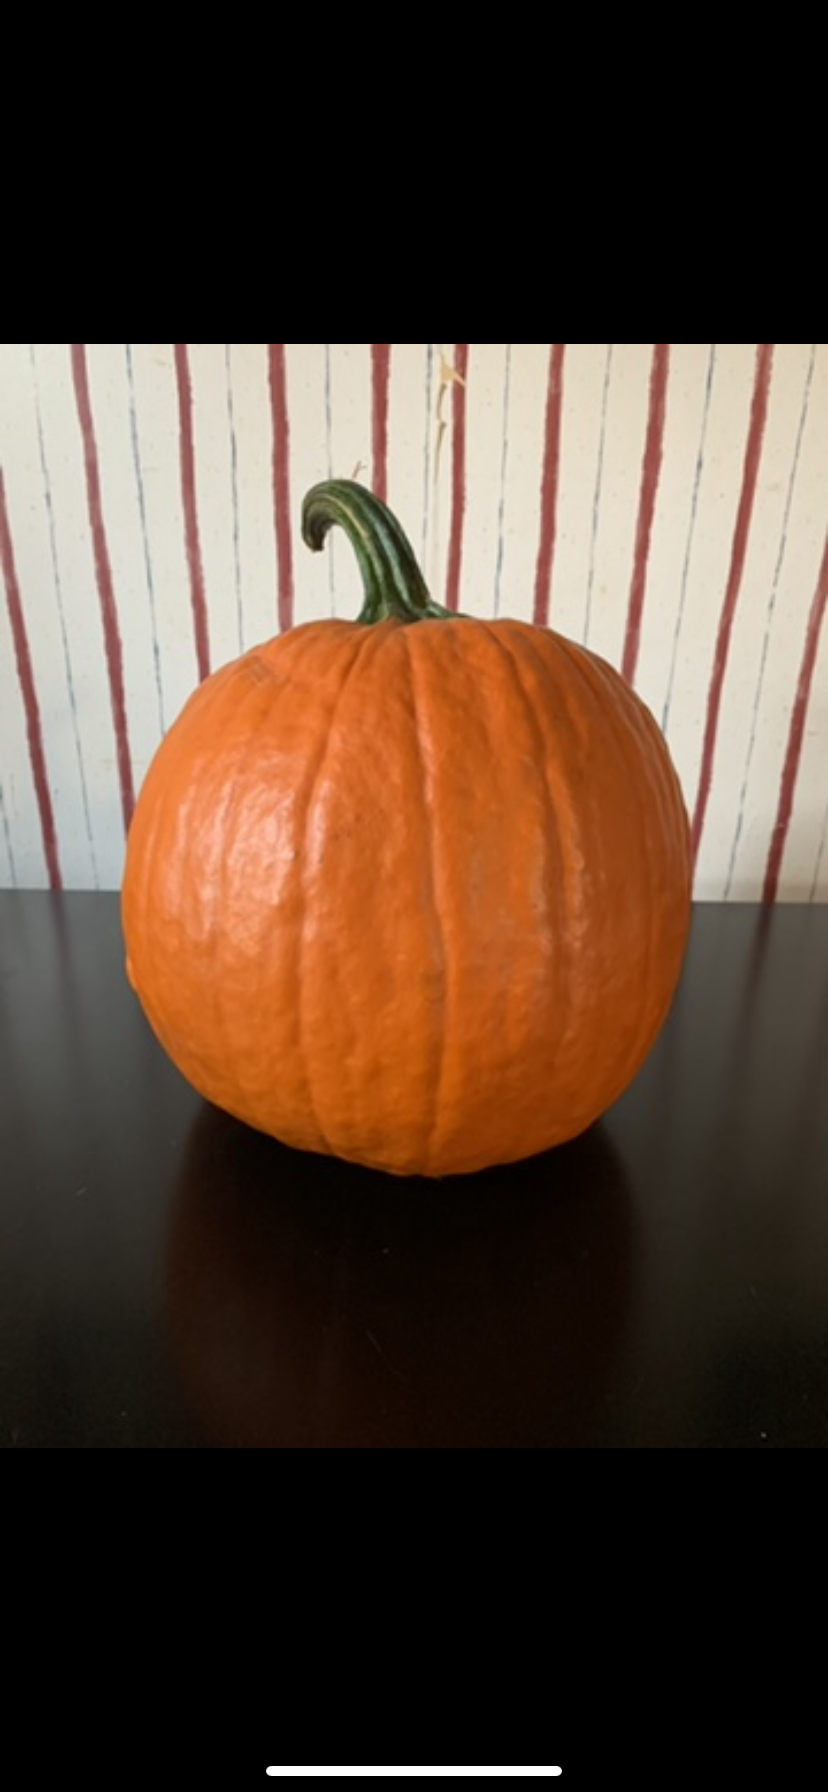 The Pumpkin Globe